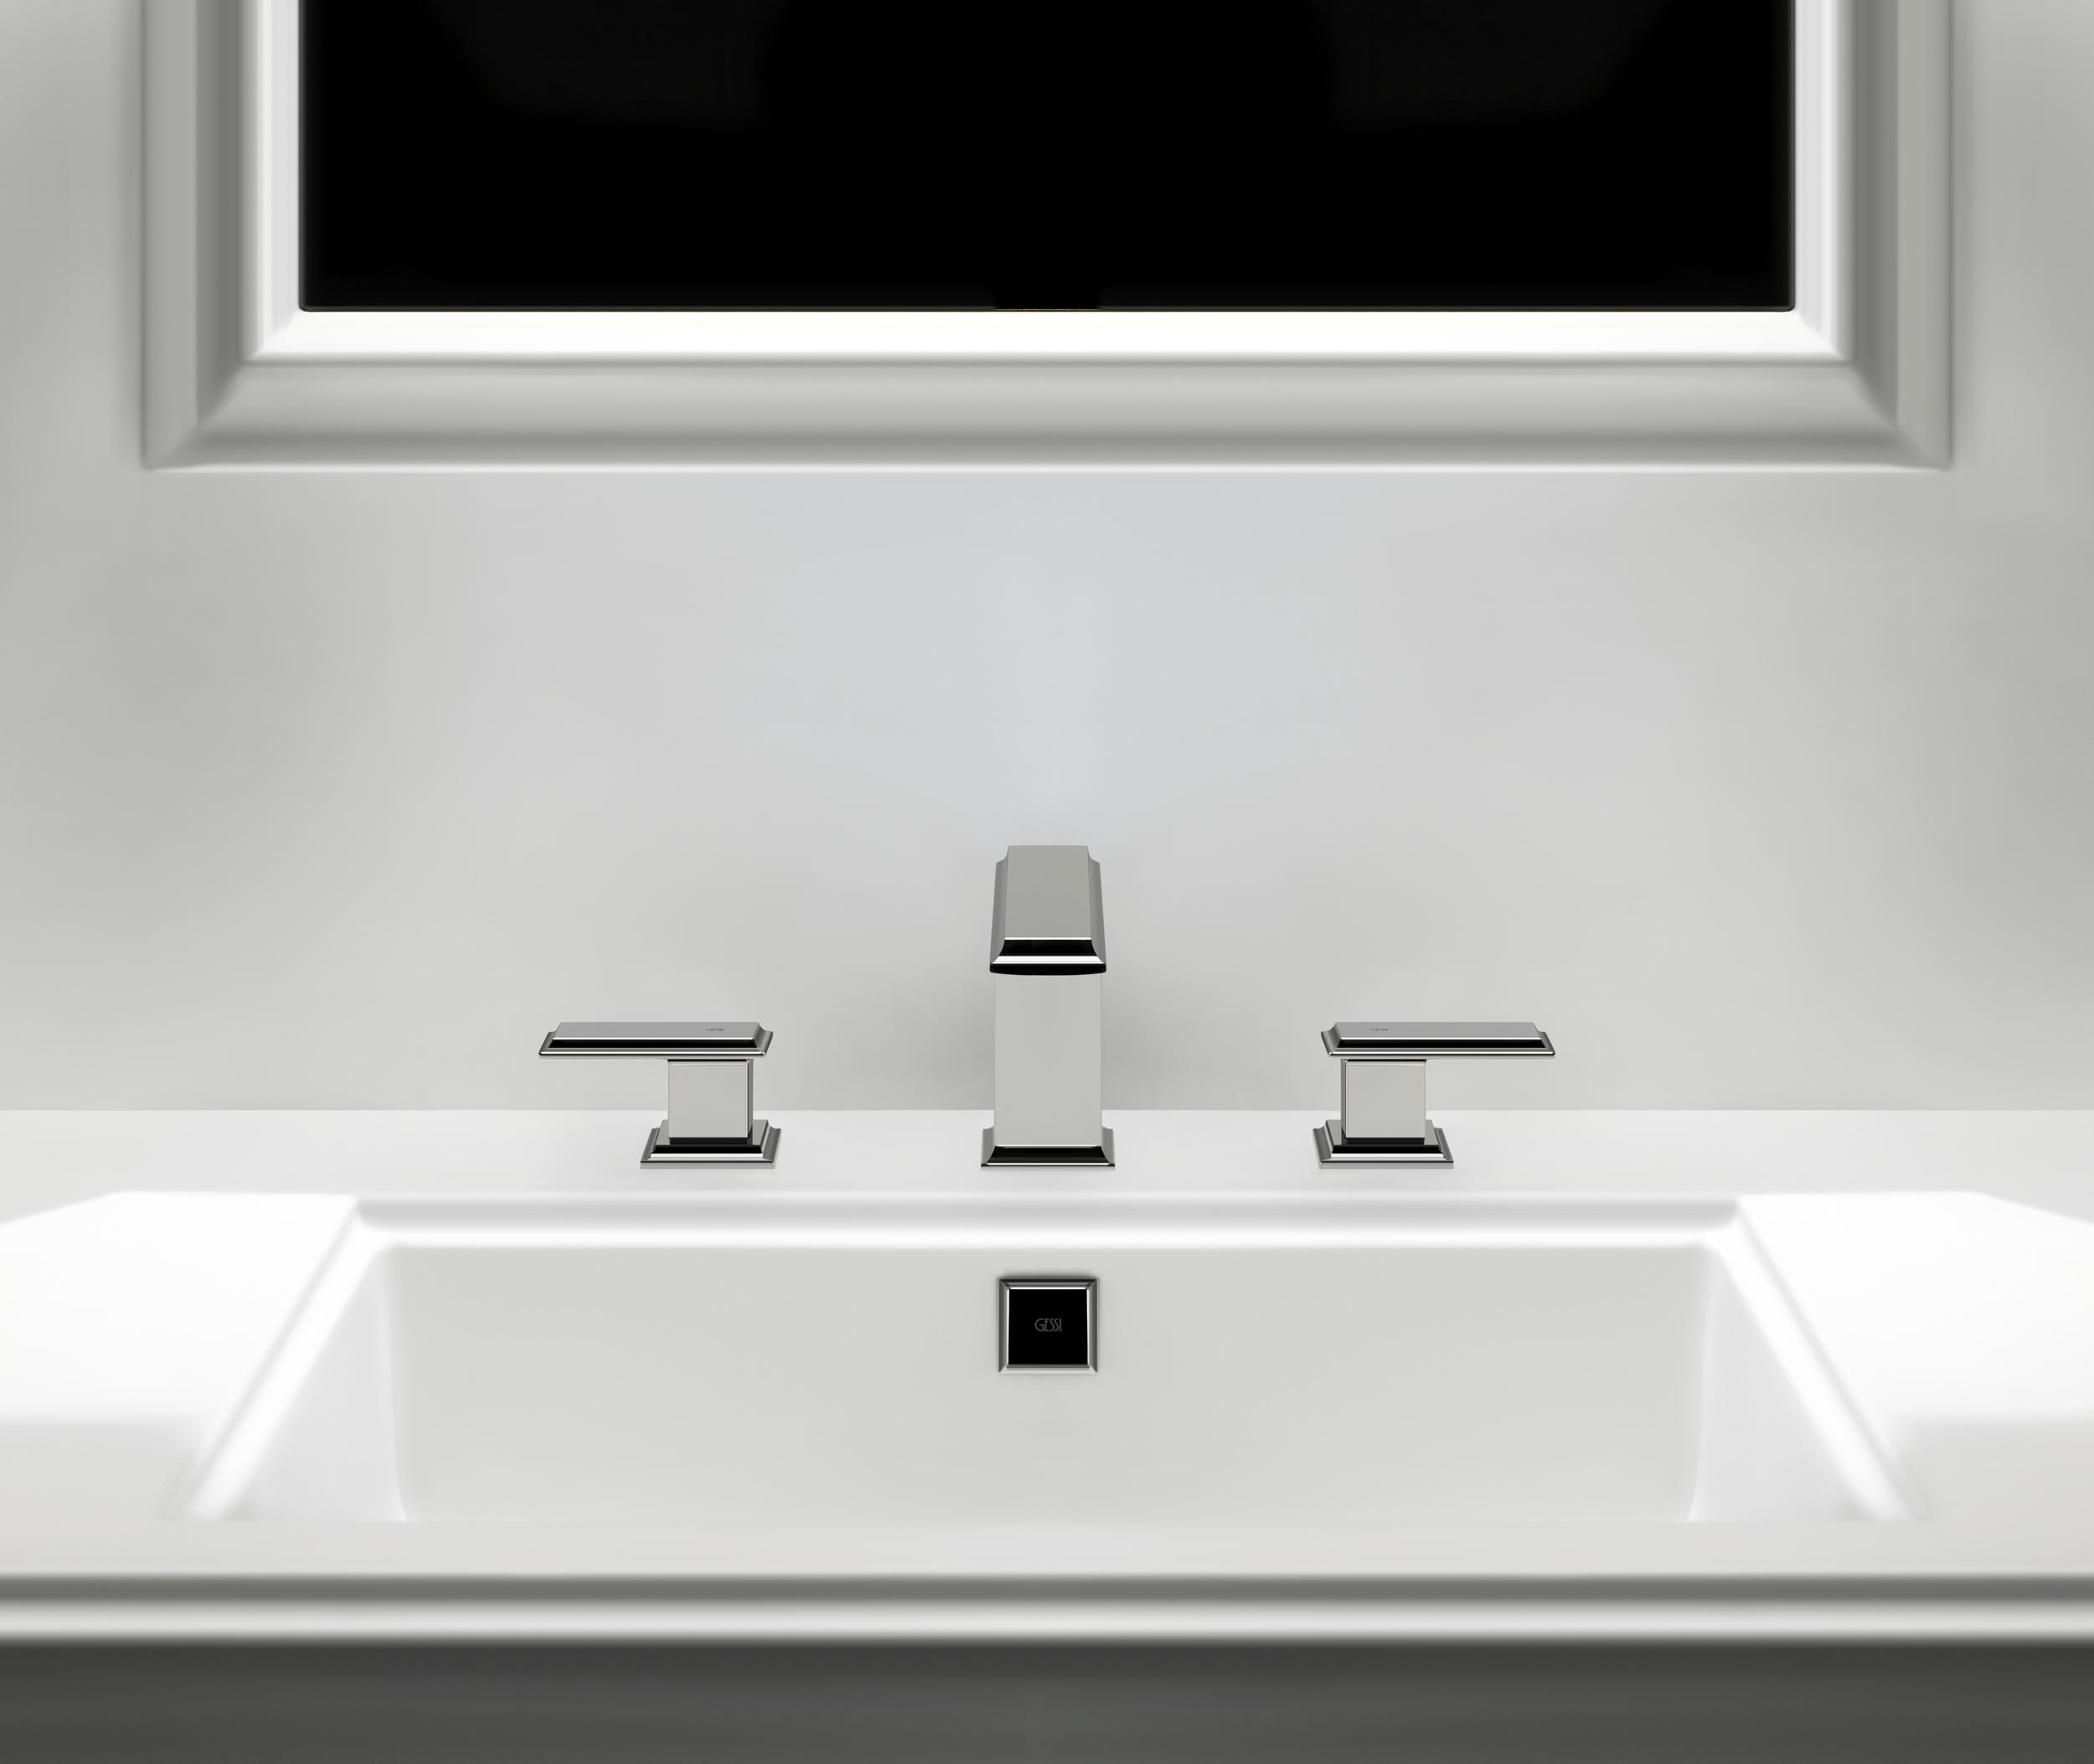 Fascino Gessi sink faucet detail.jpg